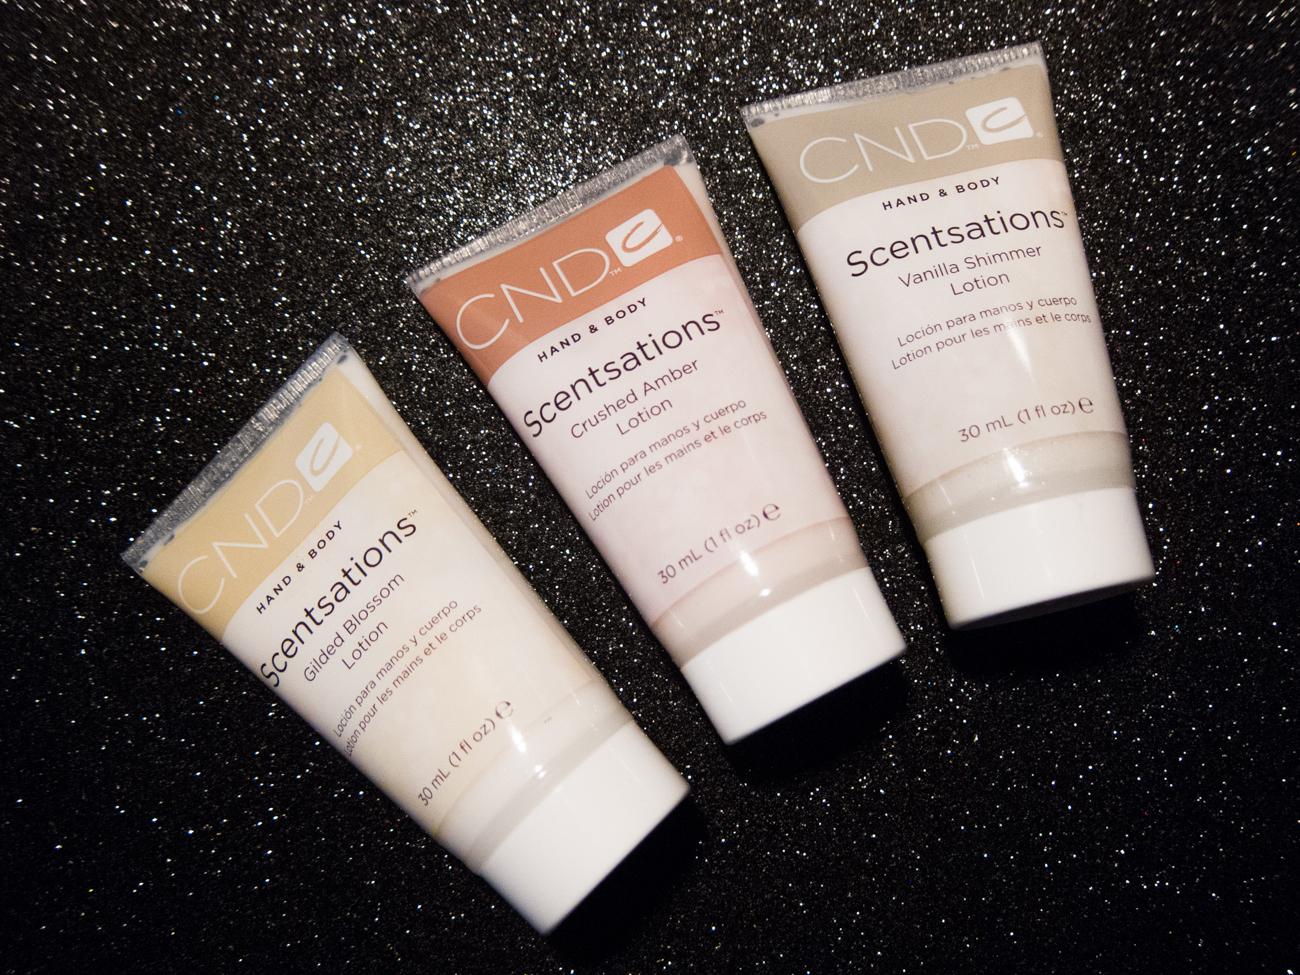 CND Scentsations Gilded Dreams lotion trio via @chalkboardnails